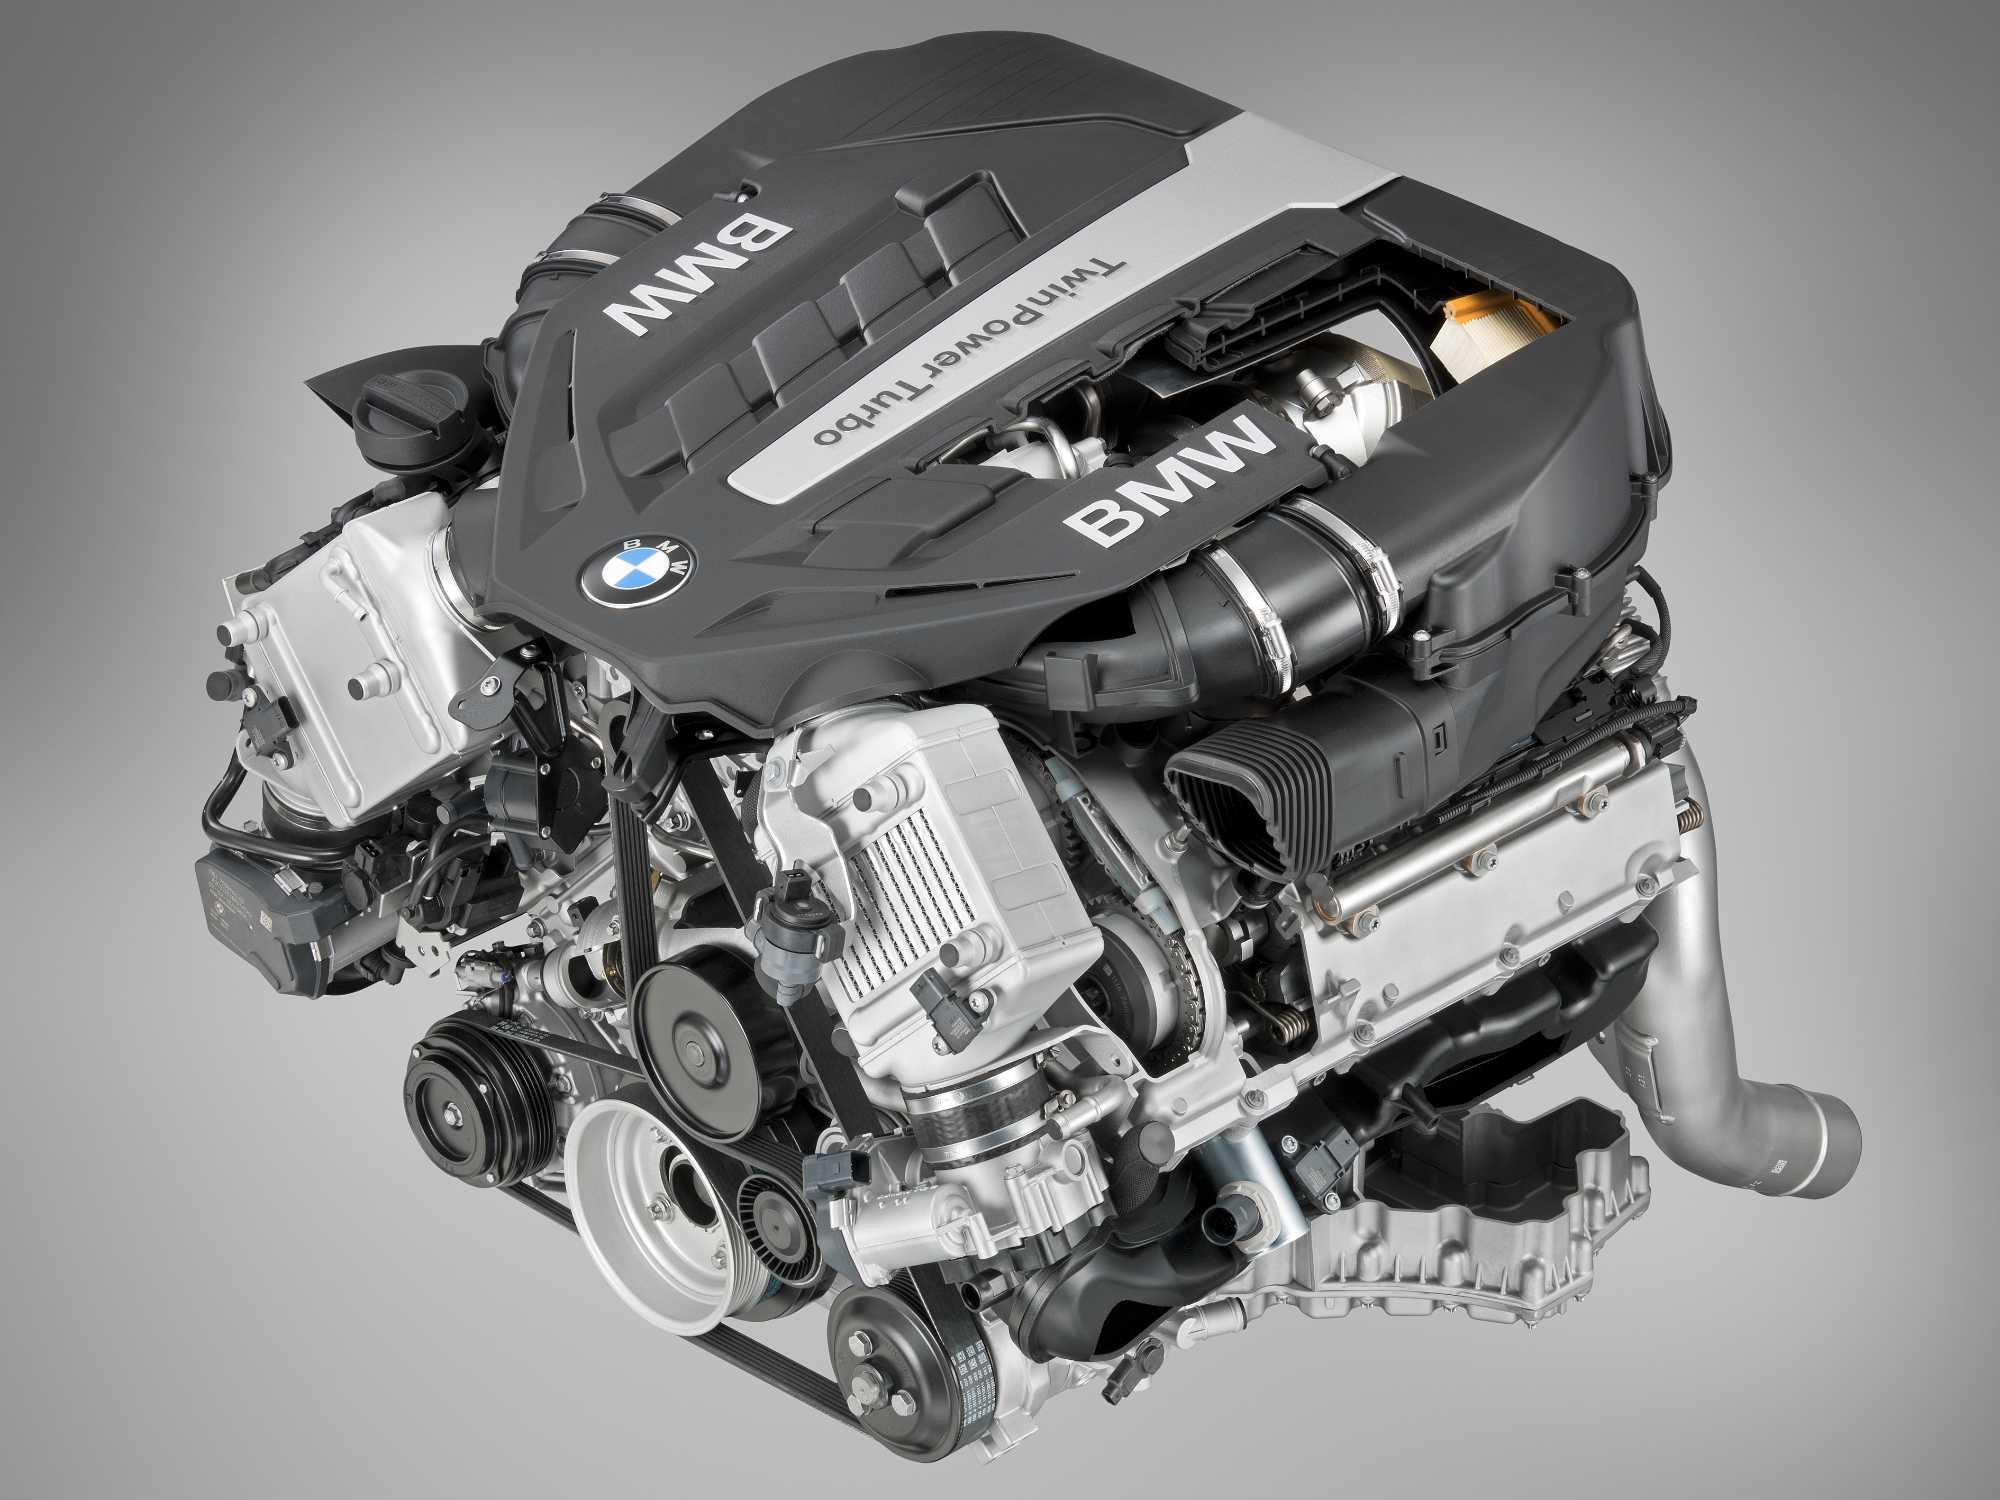 Bmw Twinpower Turbo V8 Cylinder Petrol Engine 04 2012